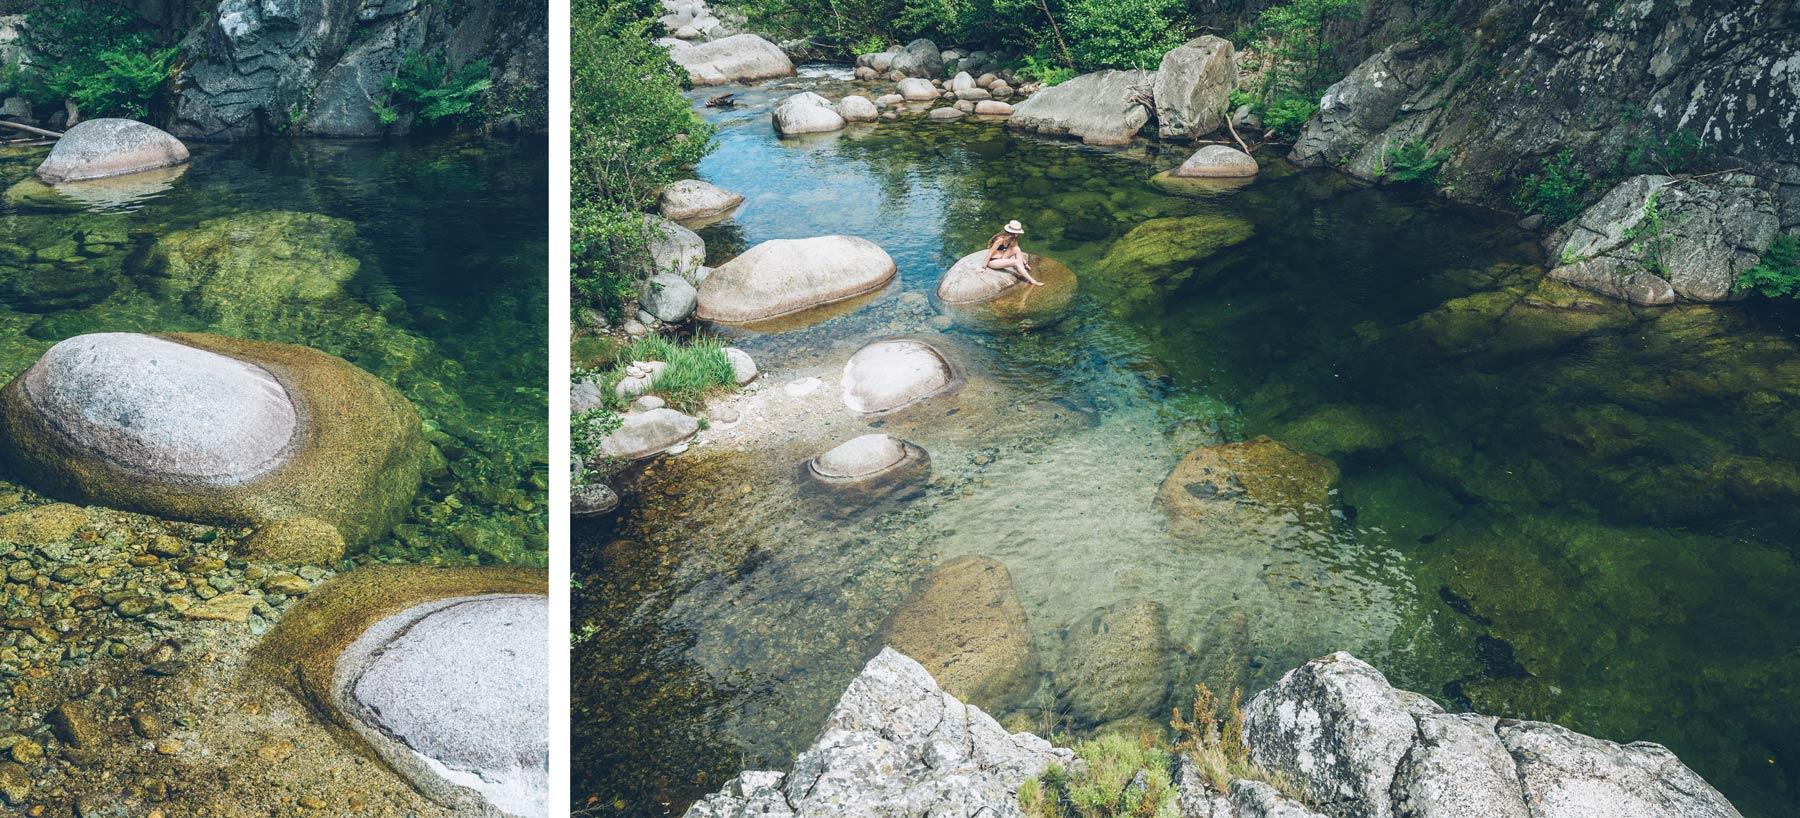 Rivière hors sentiers battus en Corse